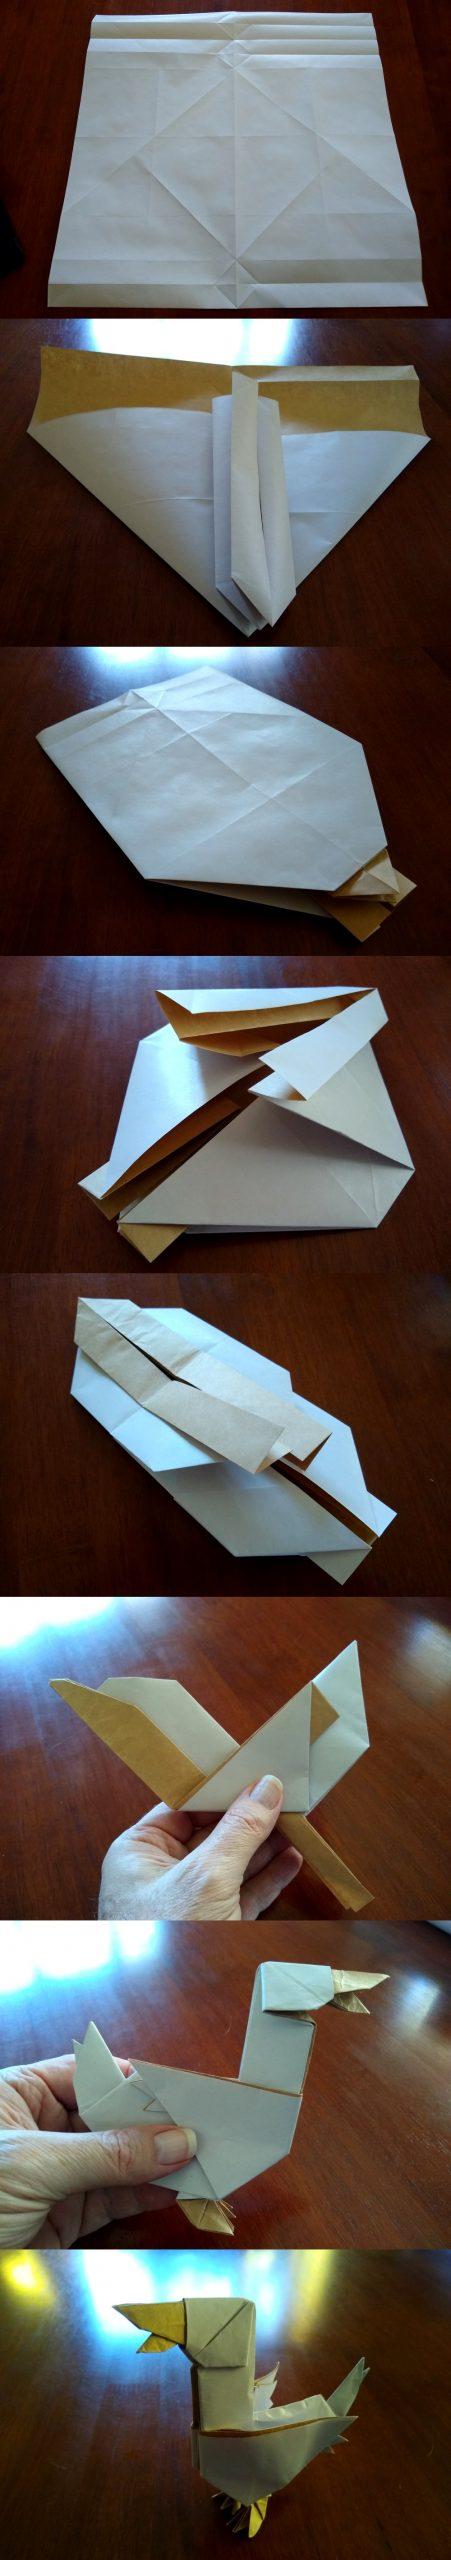 folding the duck